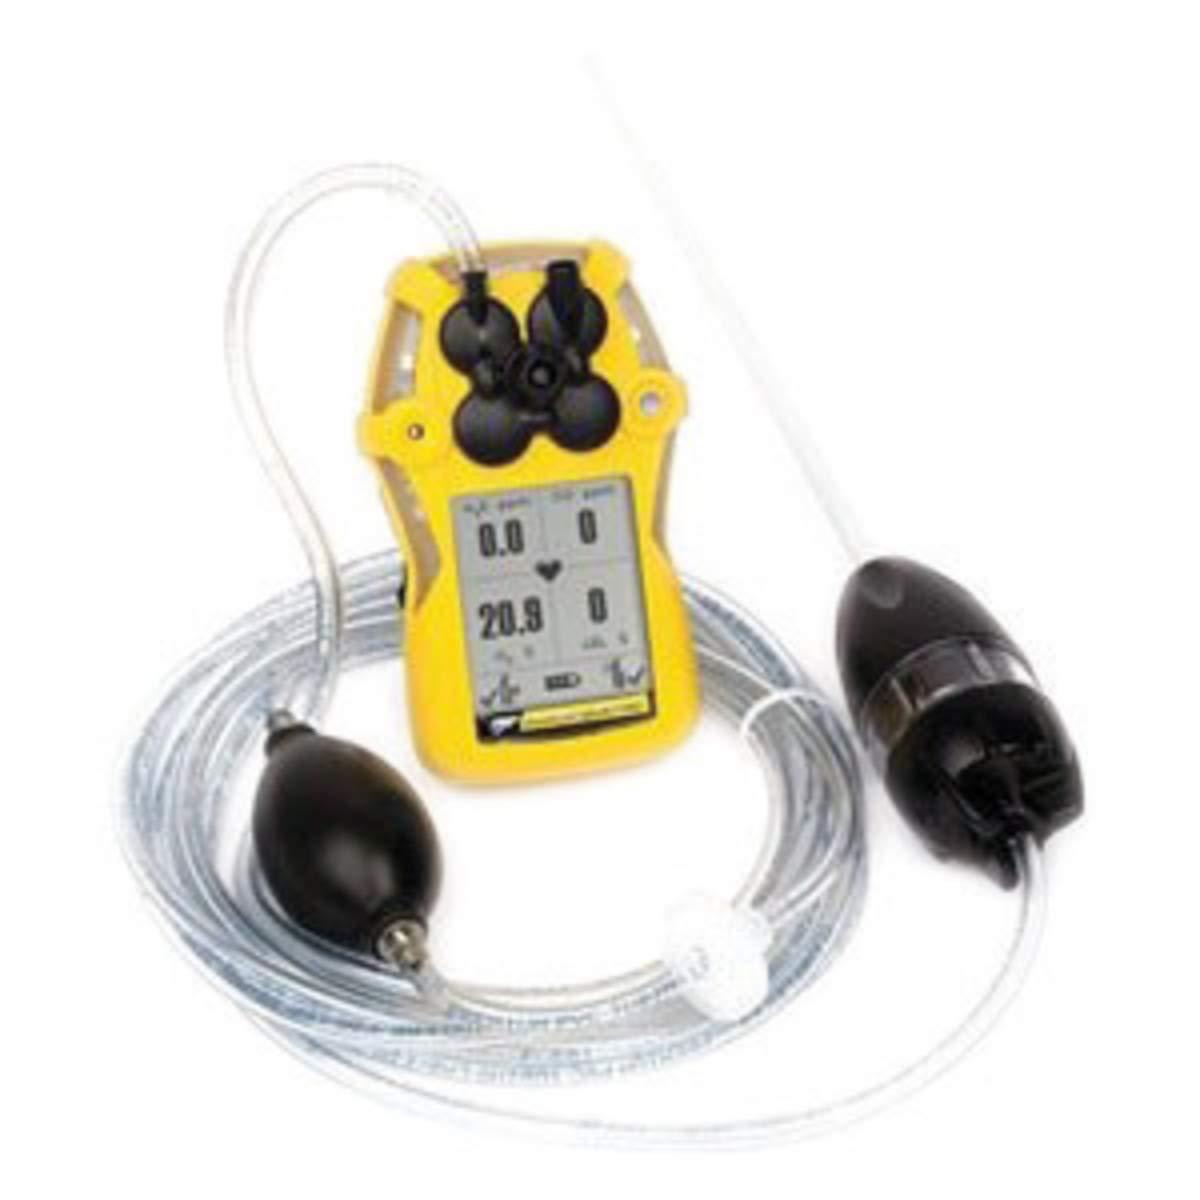 BW Technologies 131614-L3 Kit Manual Aspirator Pump W (4 Pack) by BW Technologies